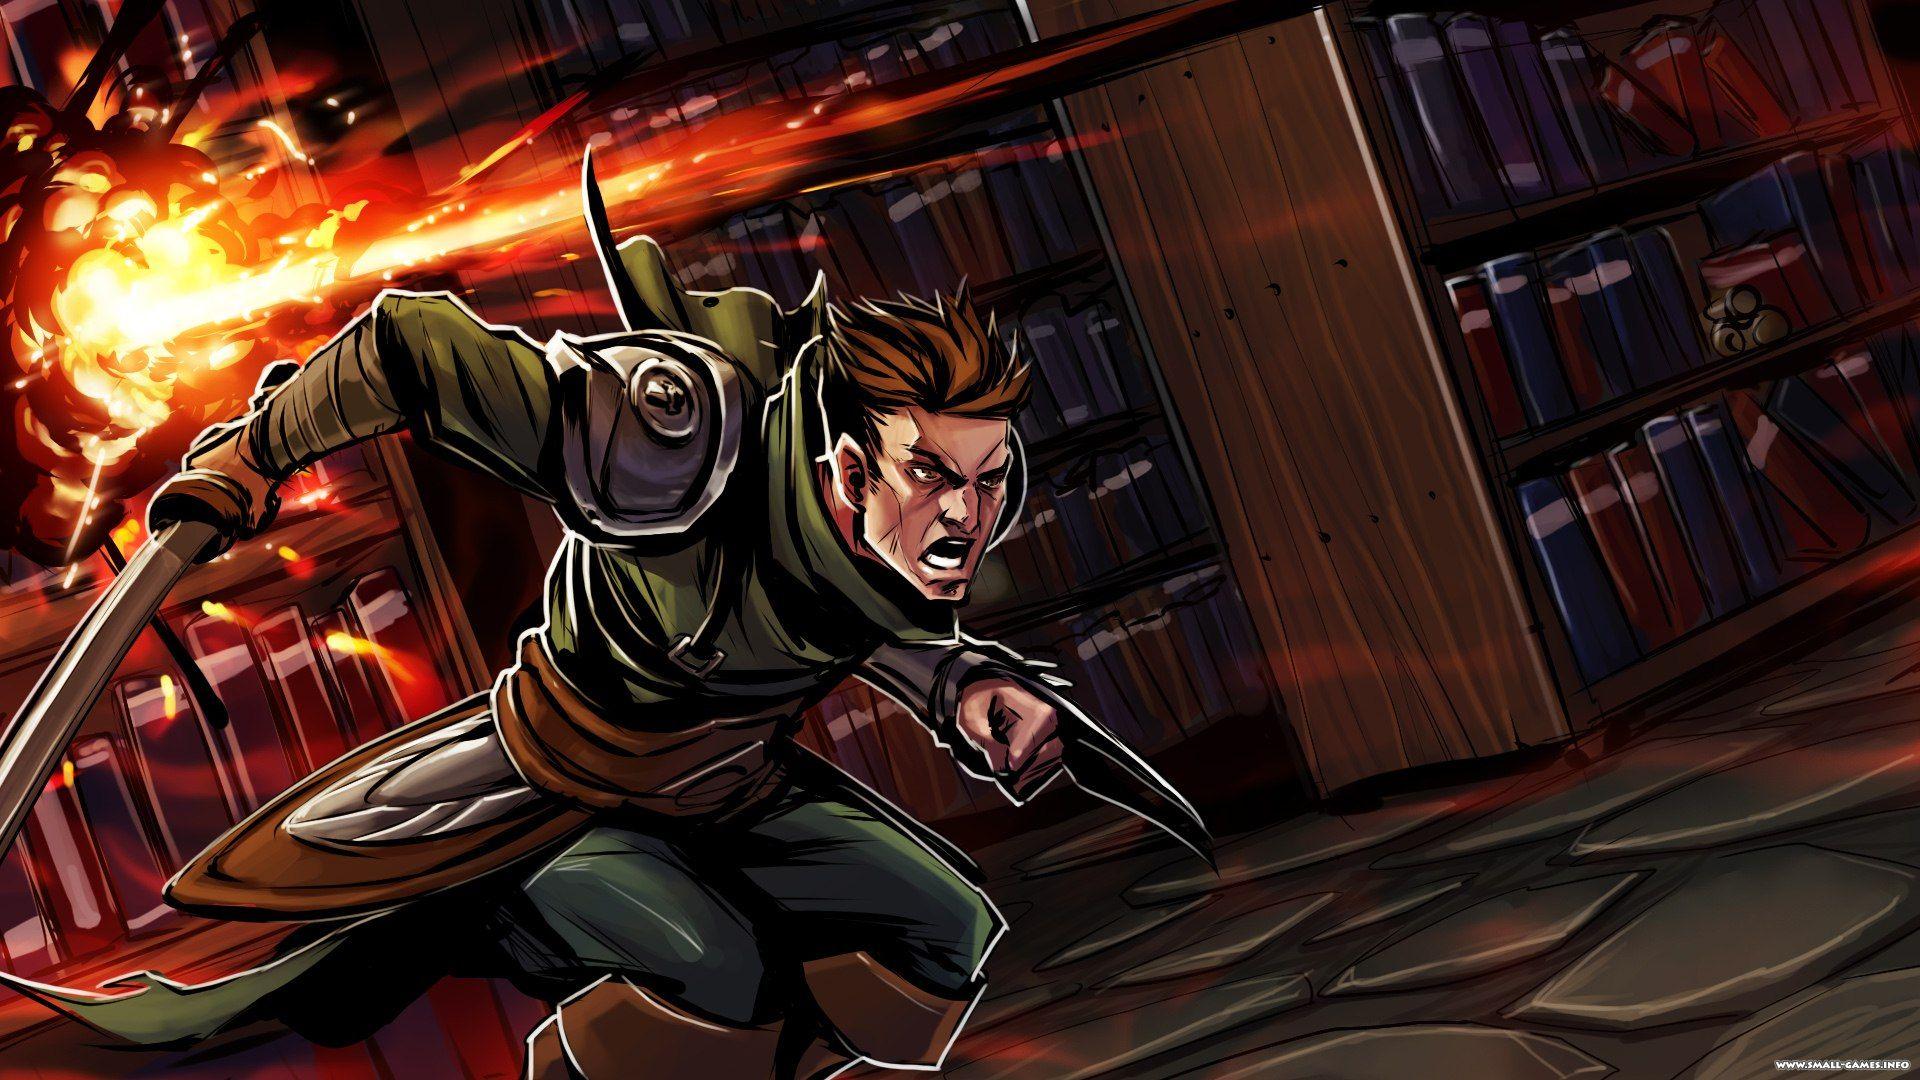 Swordbreaker the game (мечелом) невероятный трейлер!